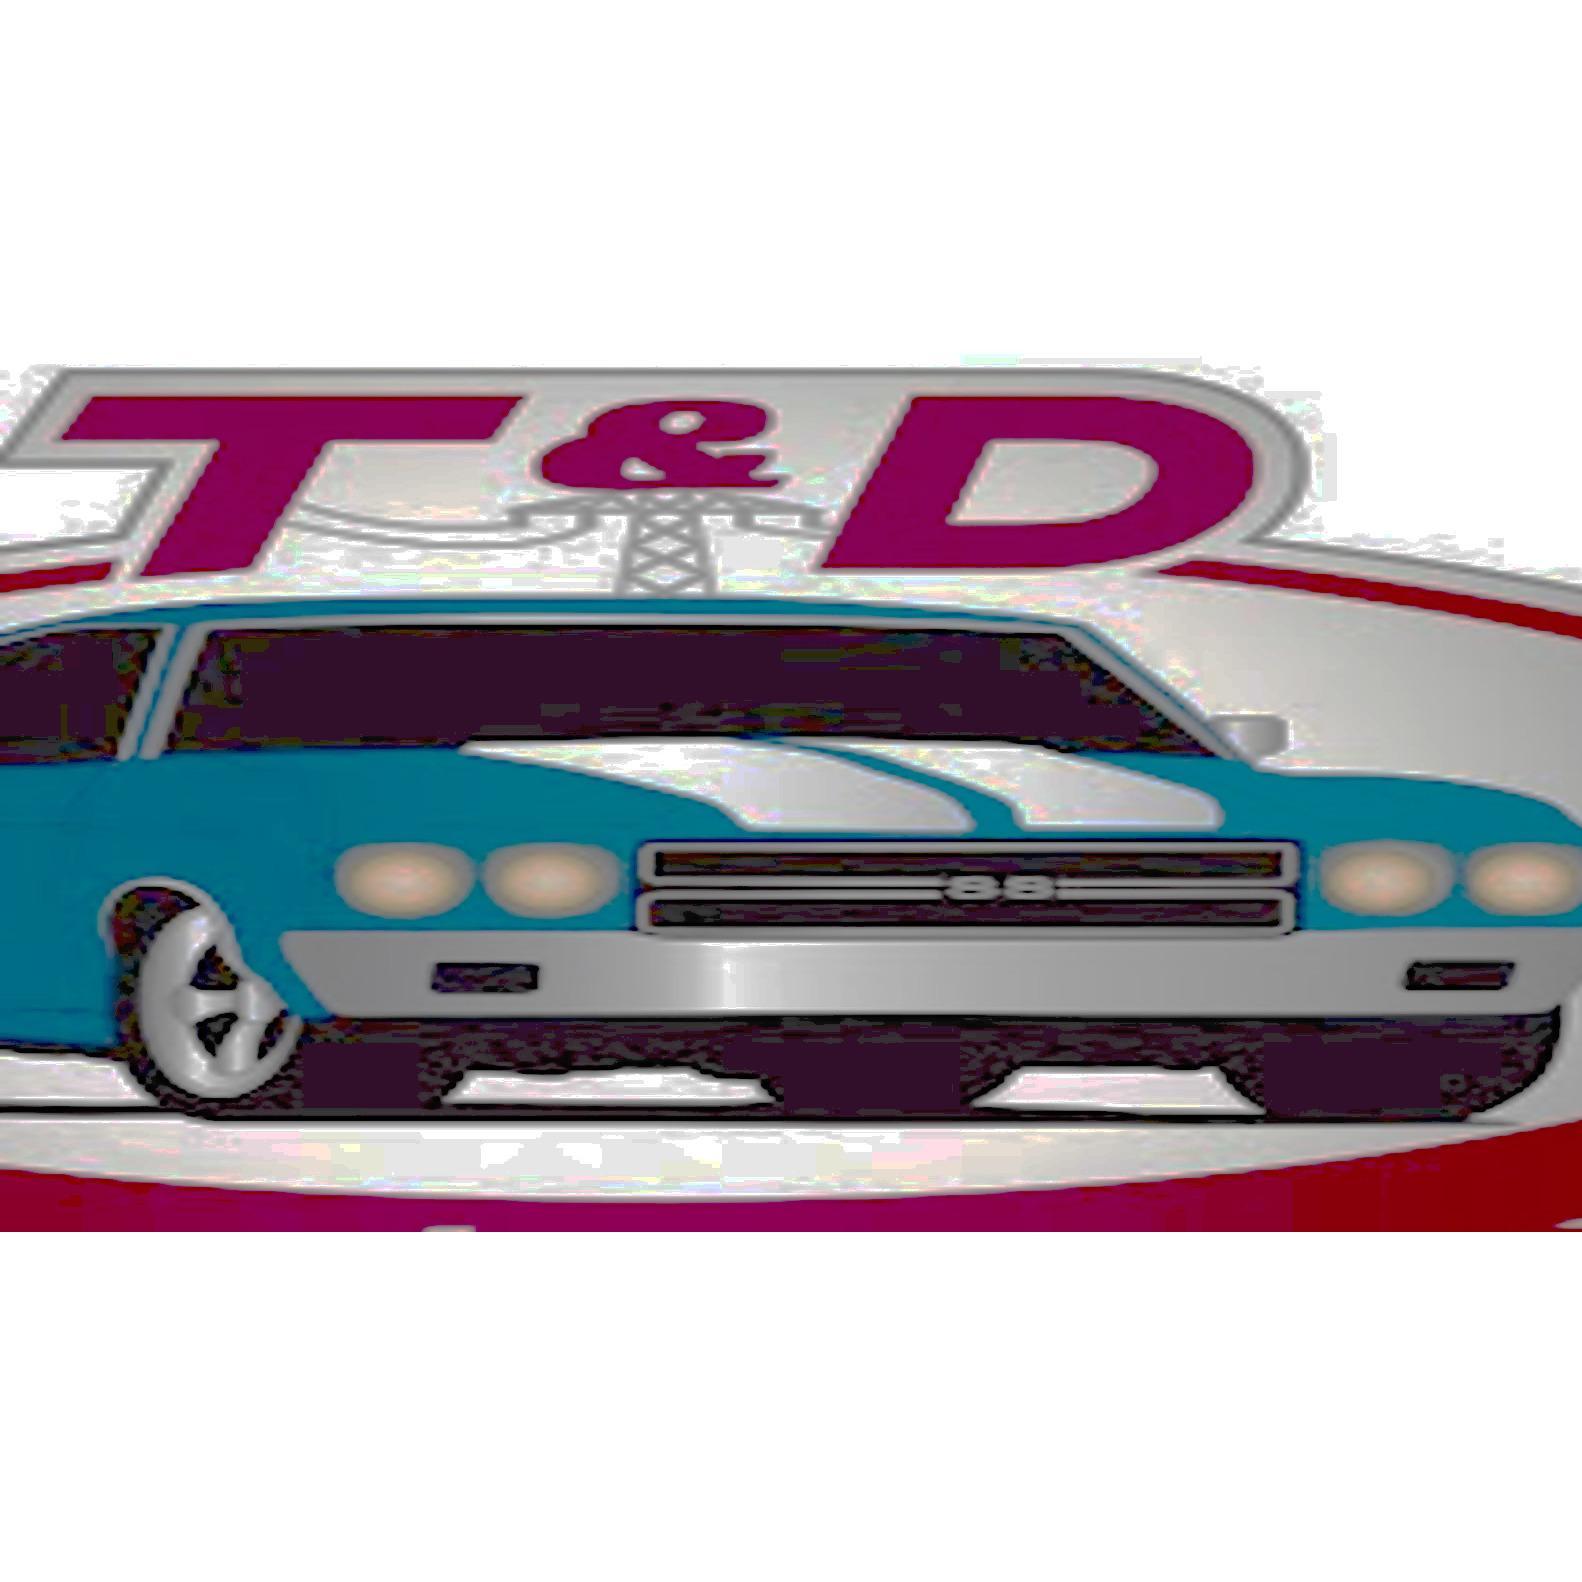 T&D Classic Cars - Holbrook, MA 02343 - (508)944-8913 | ShowMeLocal.com